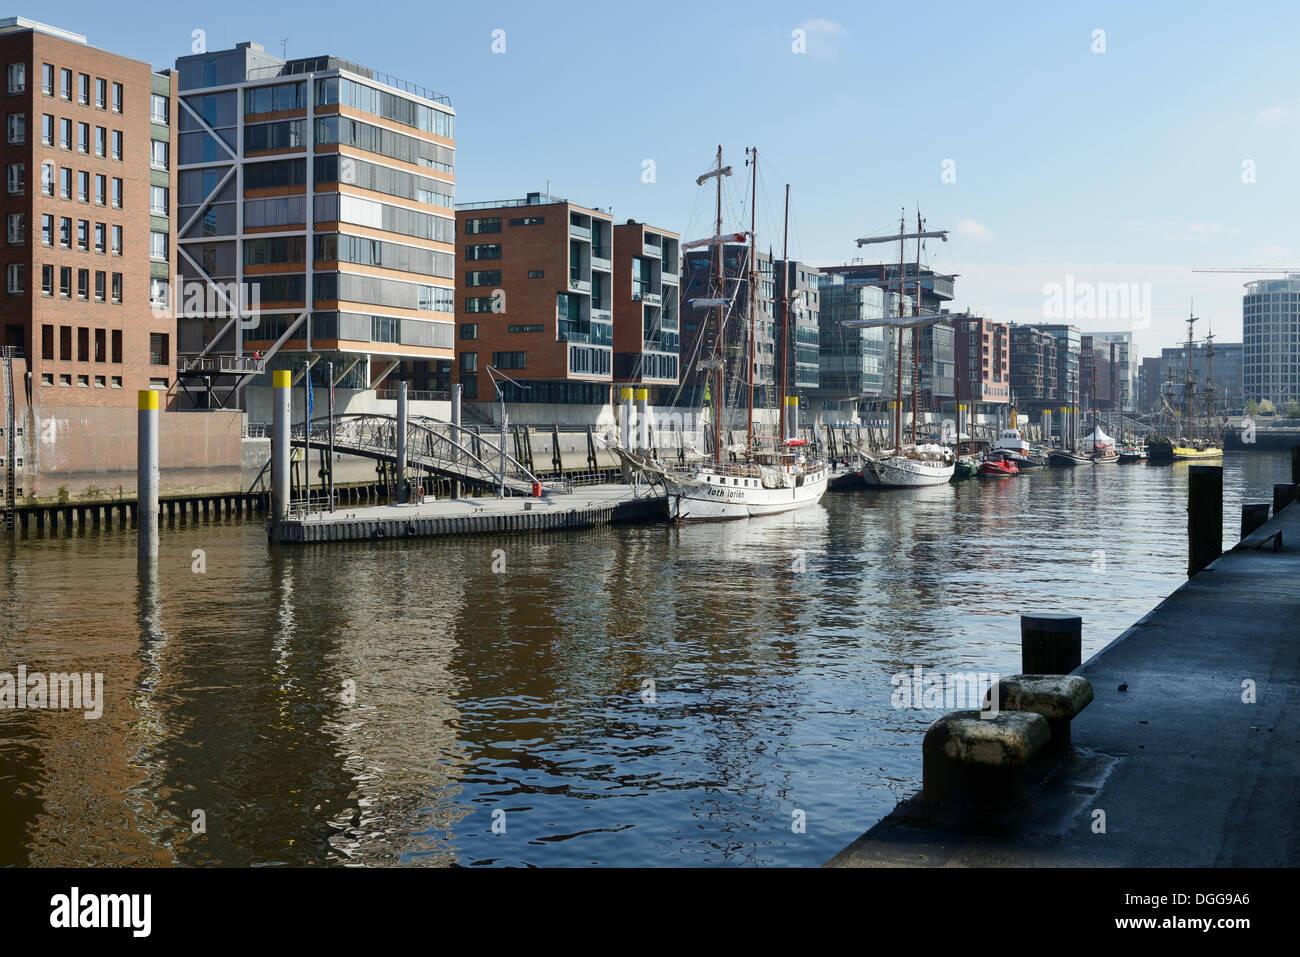 Historic sailing vessels in the historic harbor, modern residential and office buildings, Sandtorhafen, Sandtorkai and Kaiserkai - Stock Image